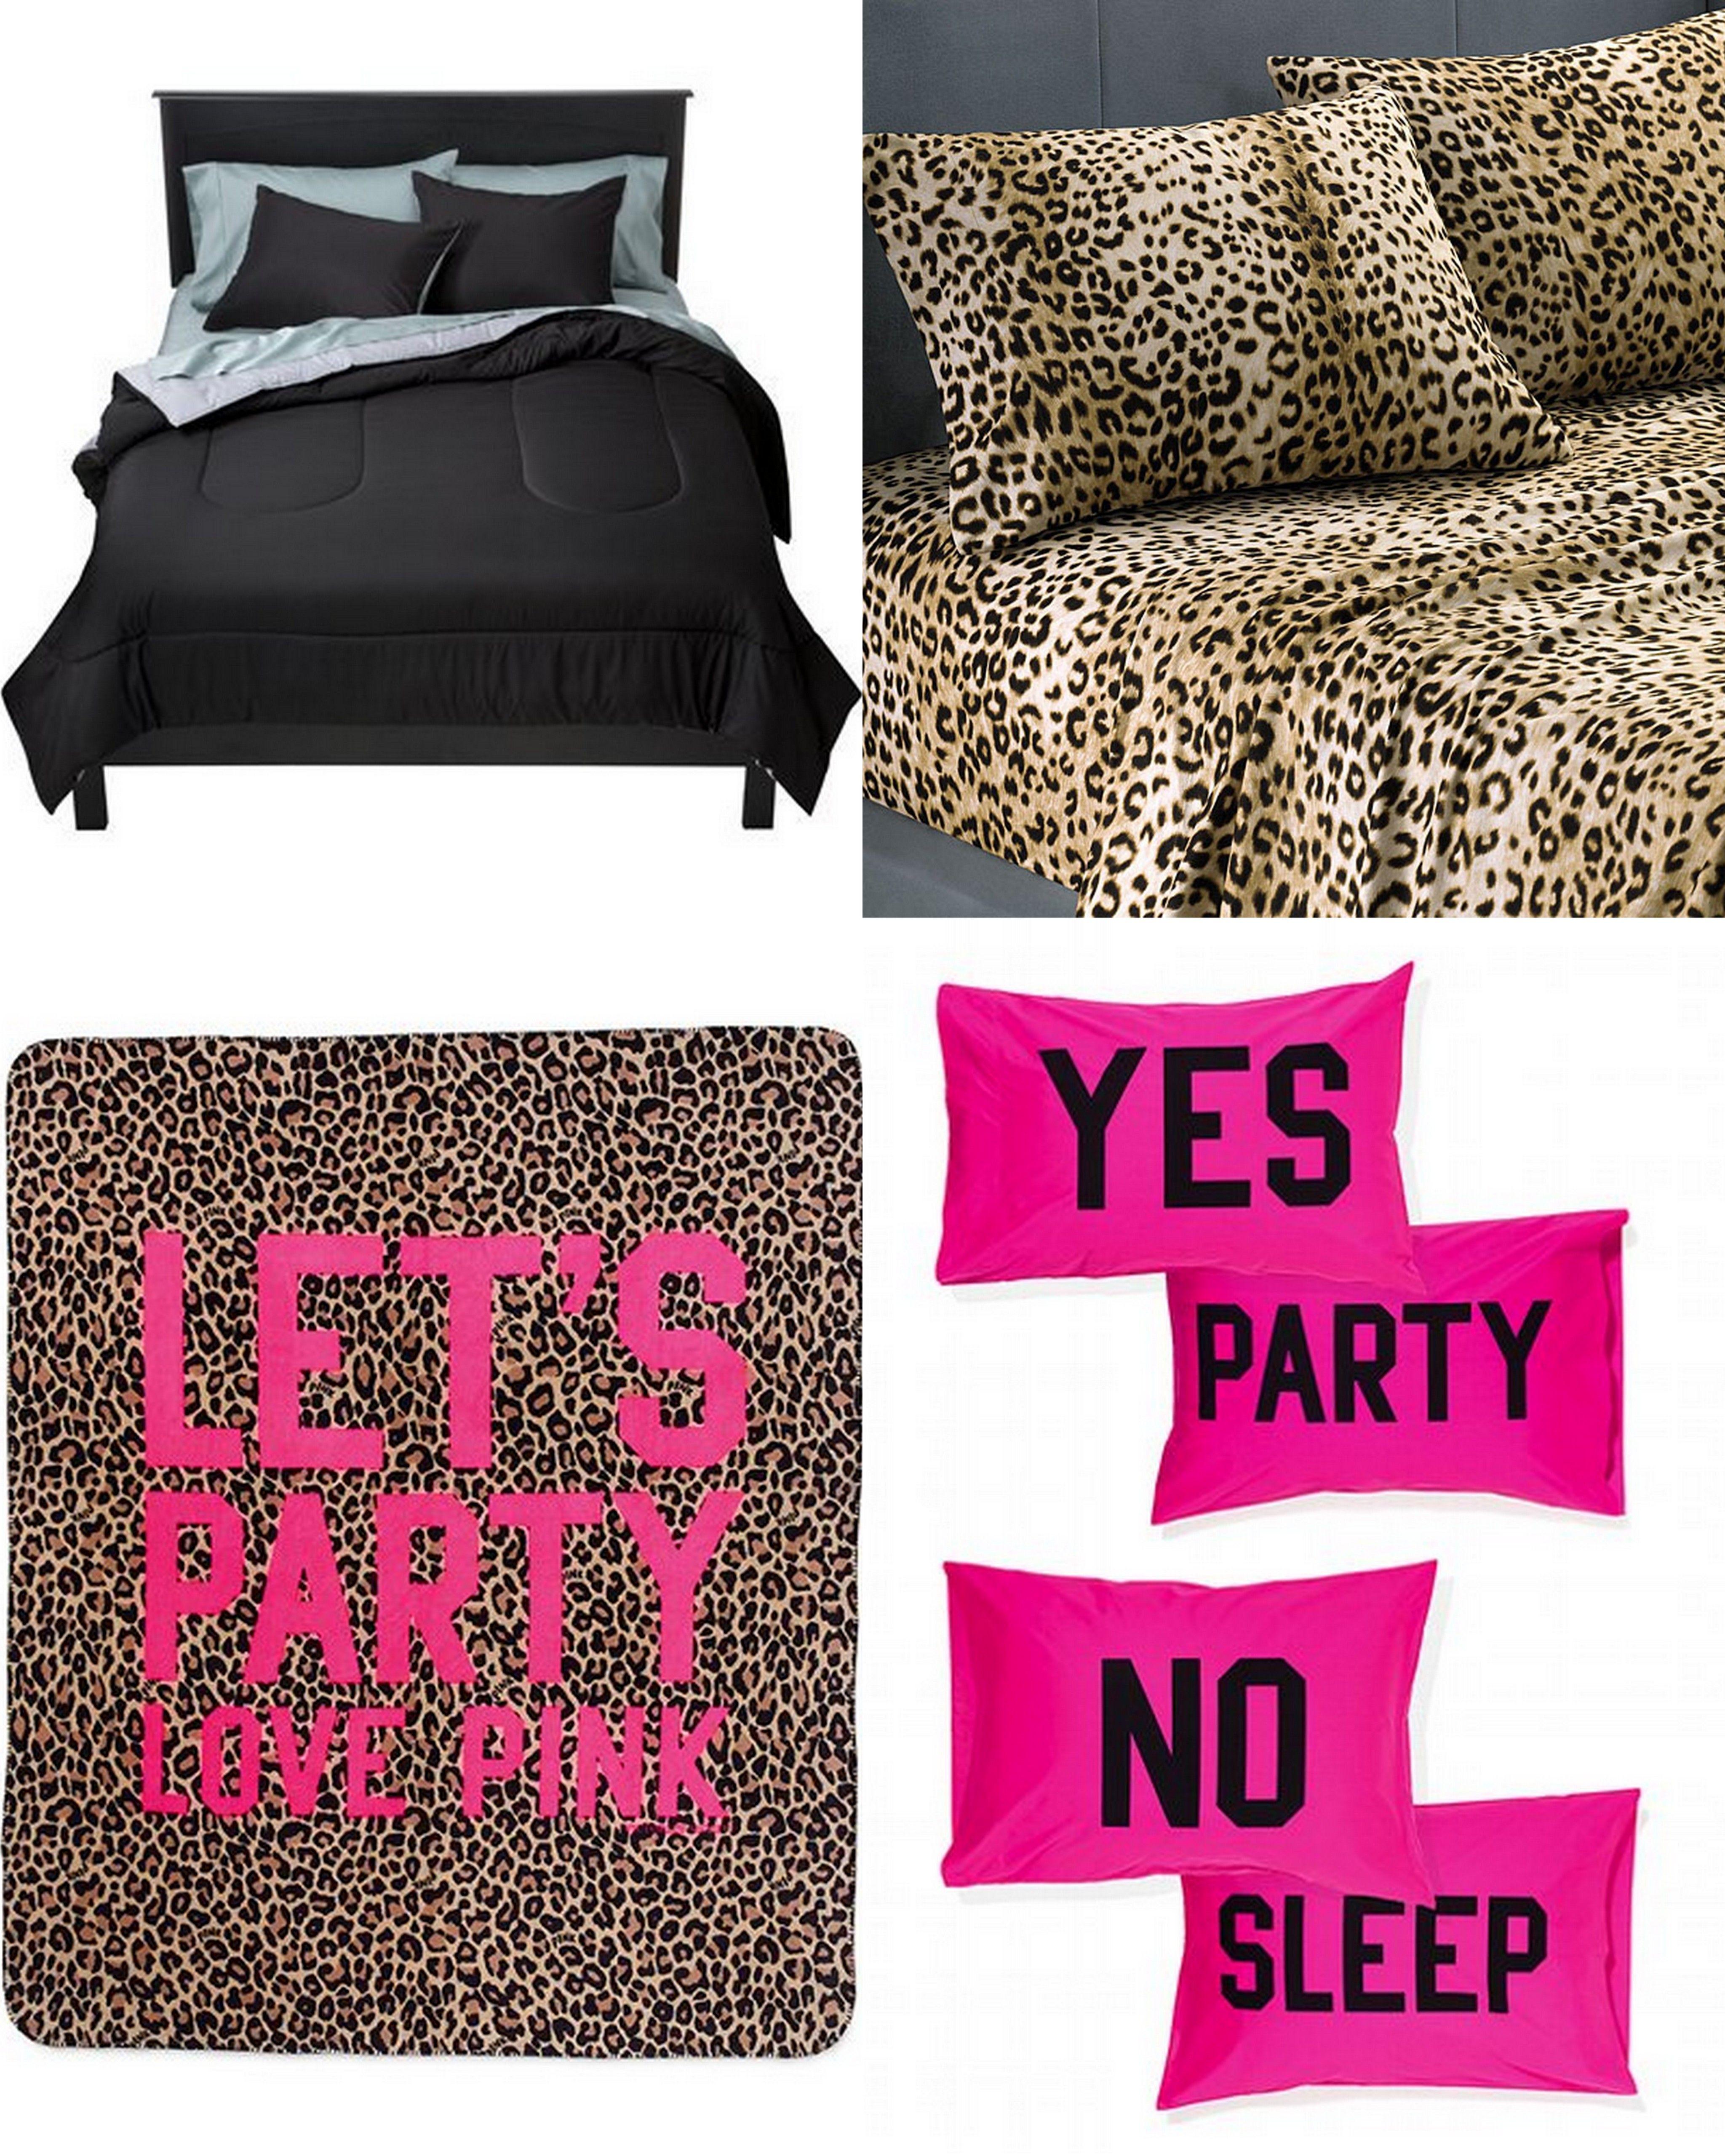 My Bed Set Target Plain Black Comforter Cheetah Sheets Pillowcases Vs Pink Stadium Blanket Pillowcase